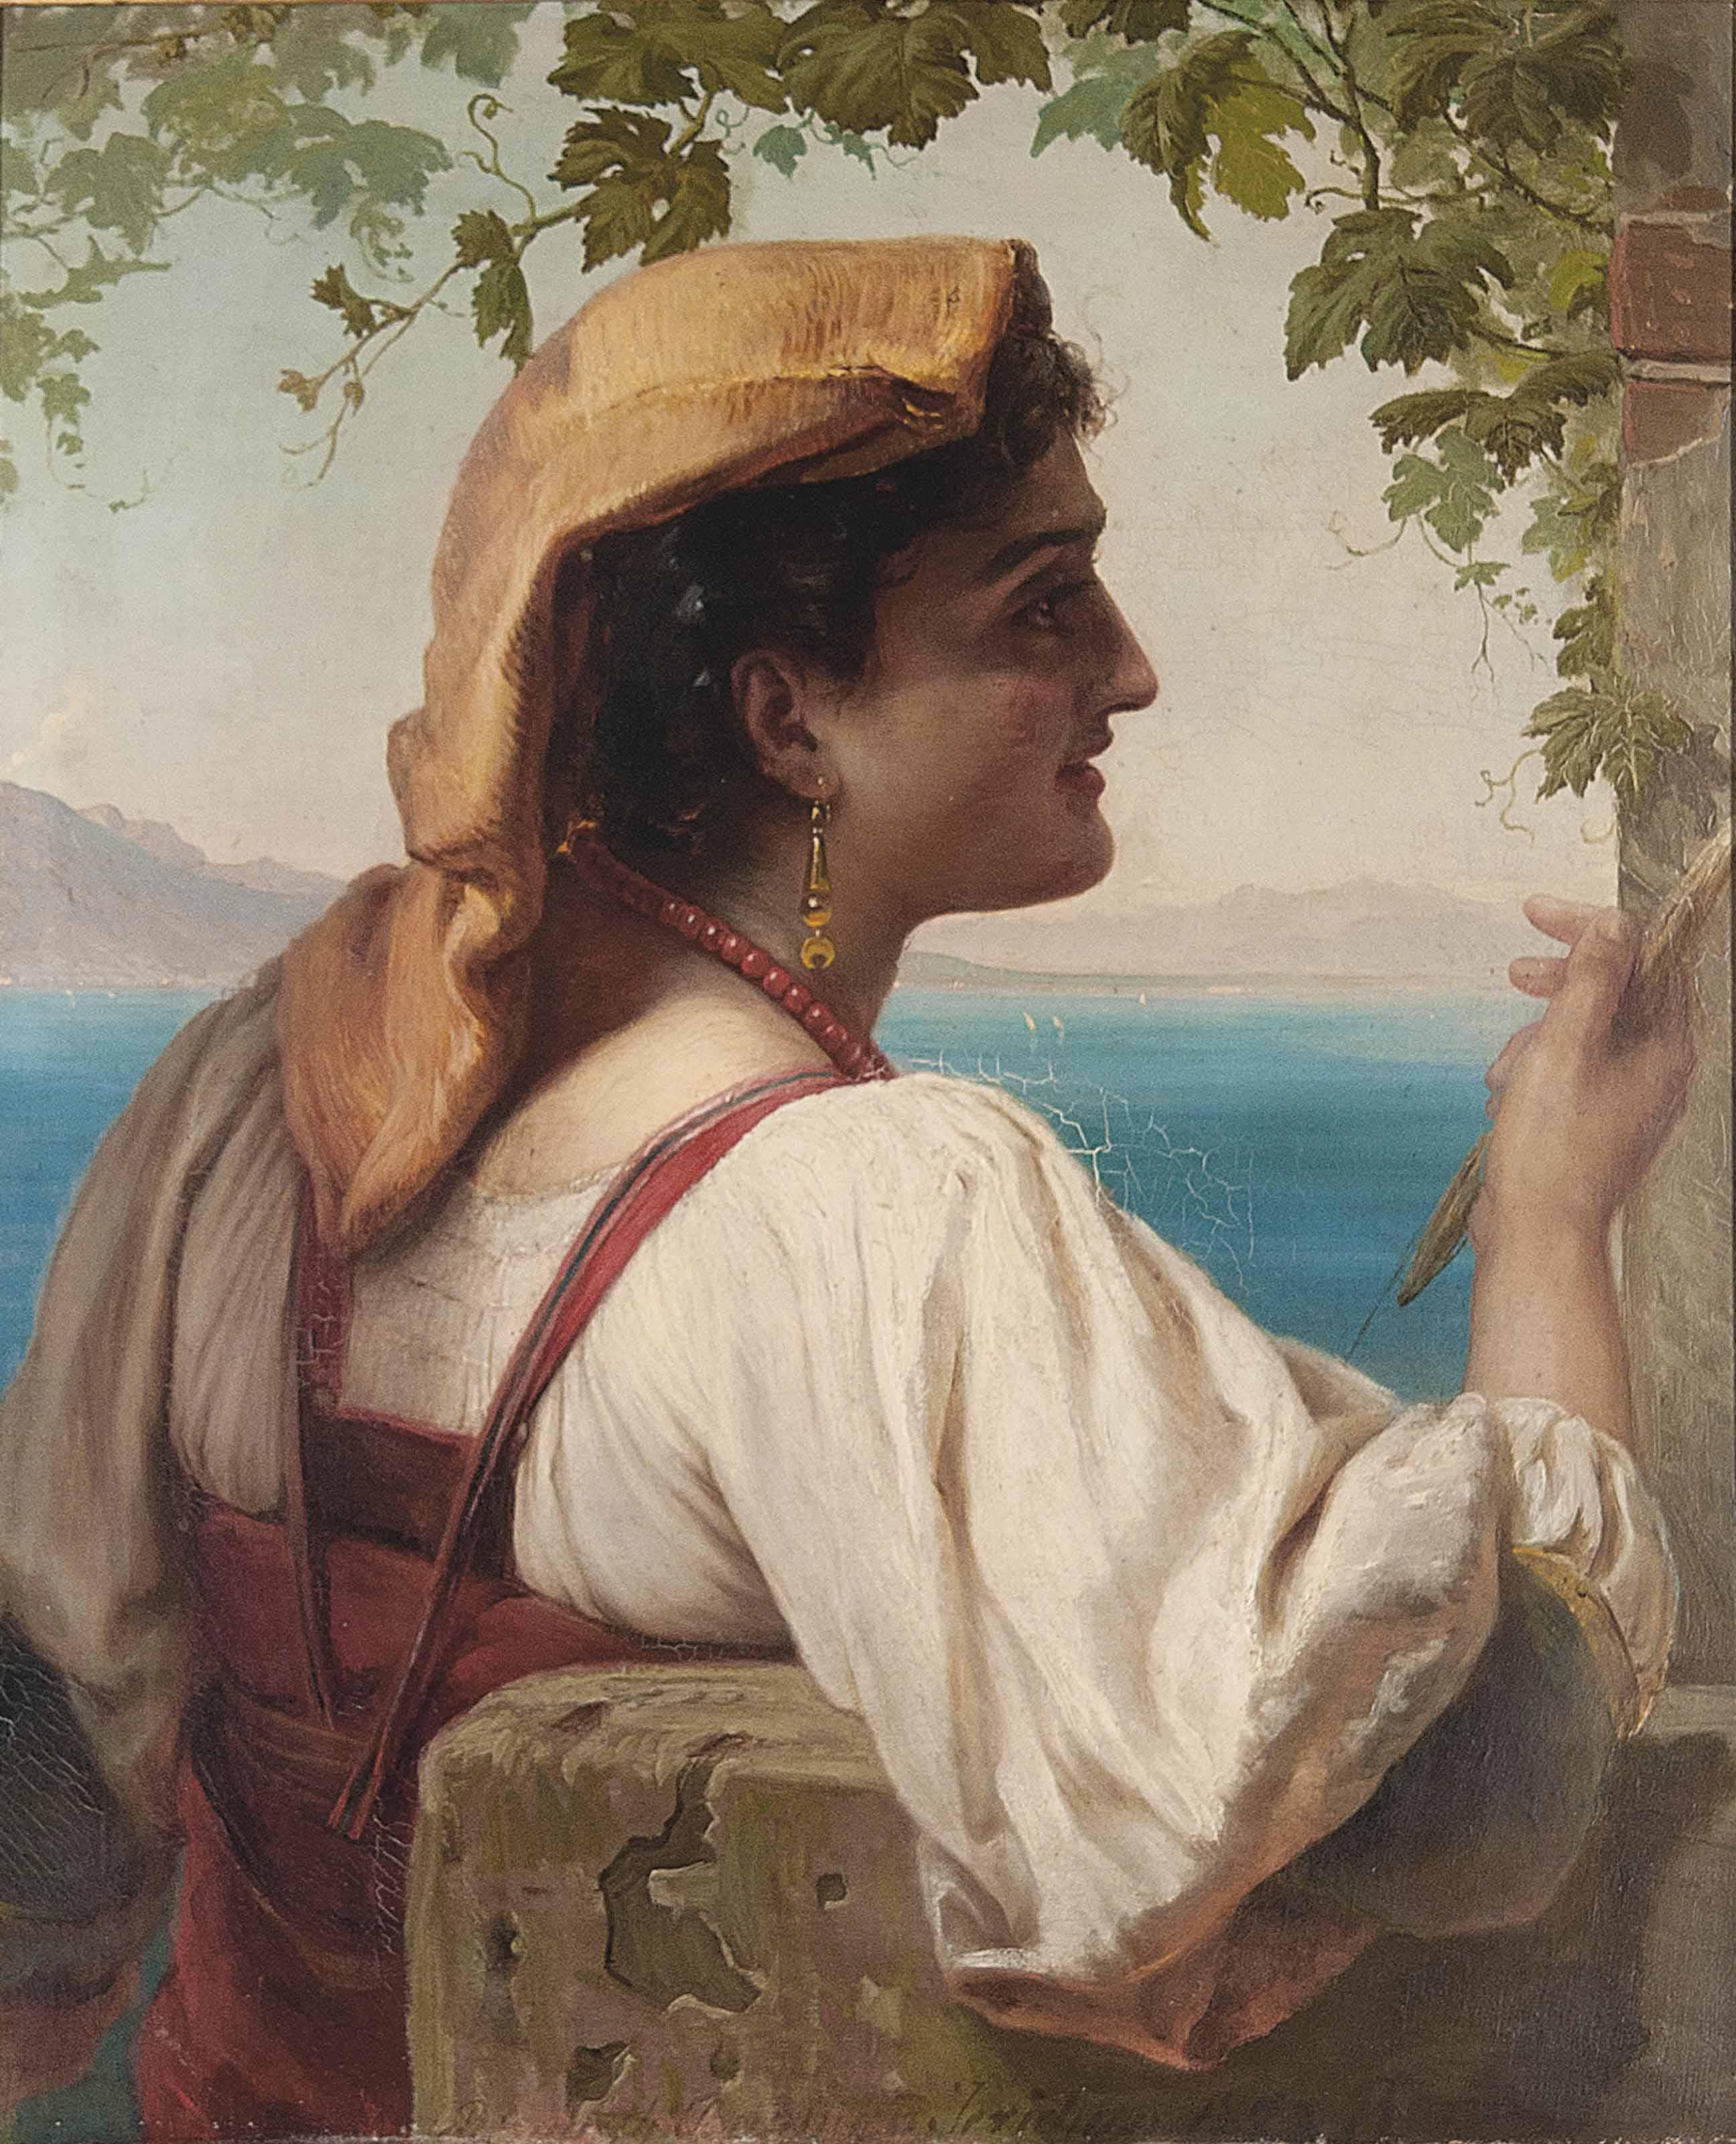 An Italian maiden mending nets on the Bay of Naples